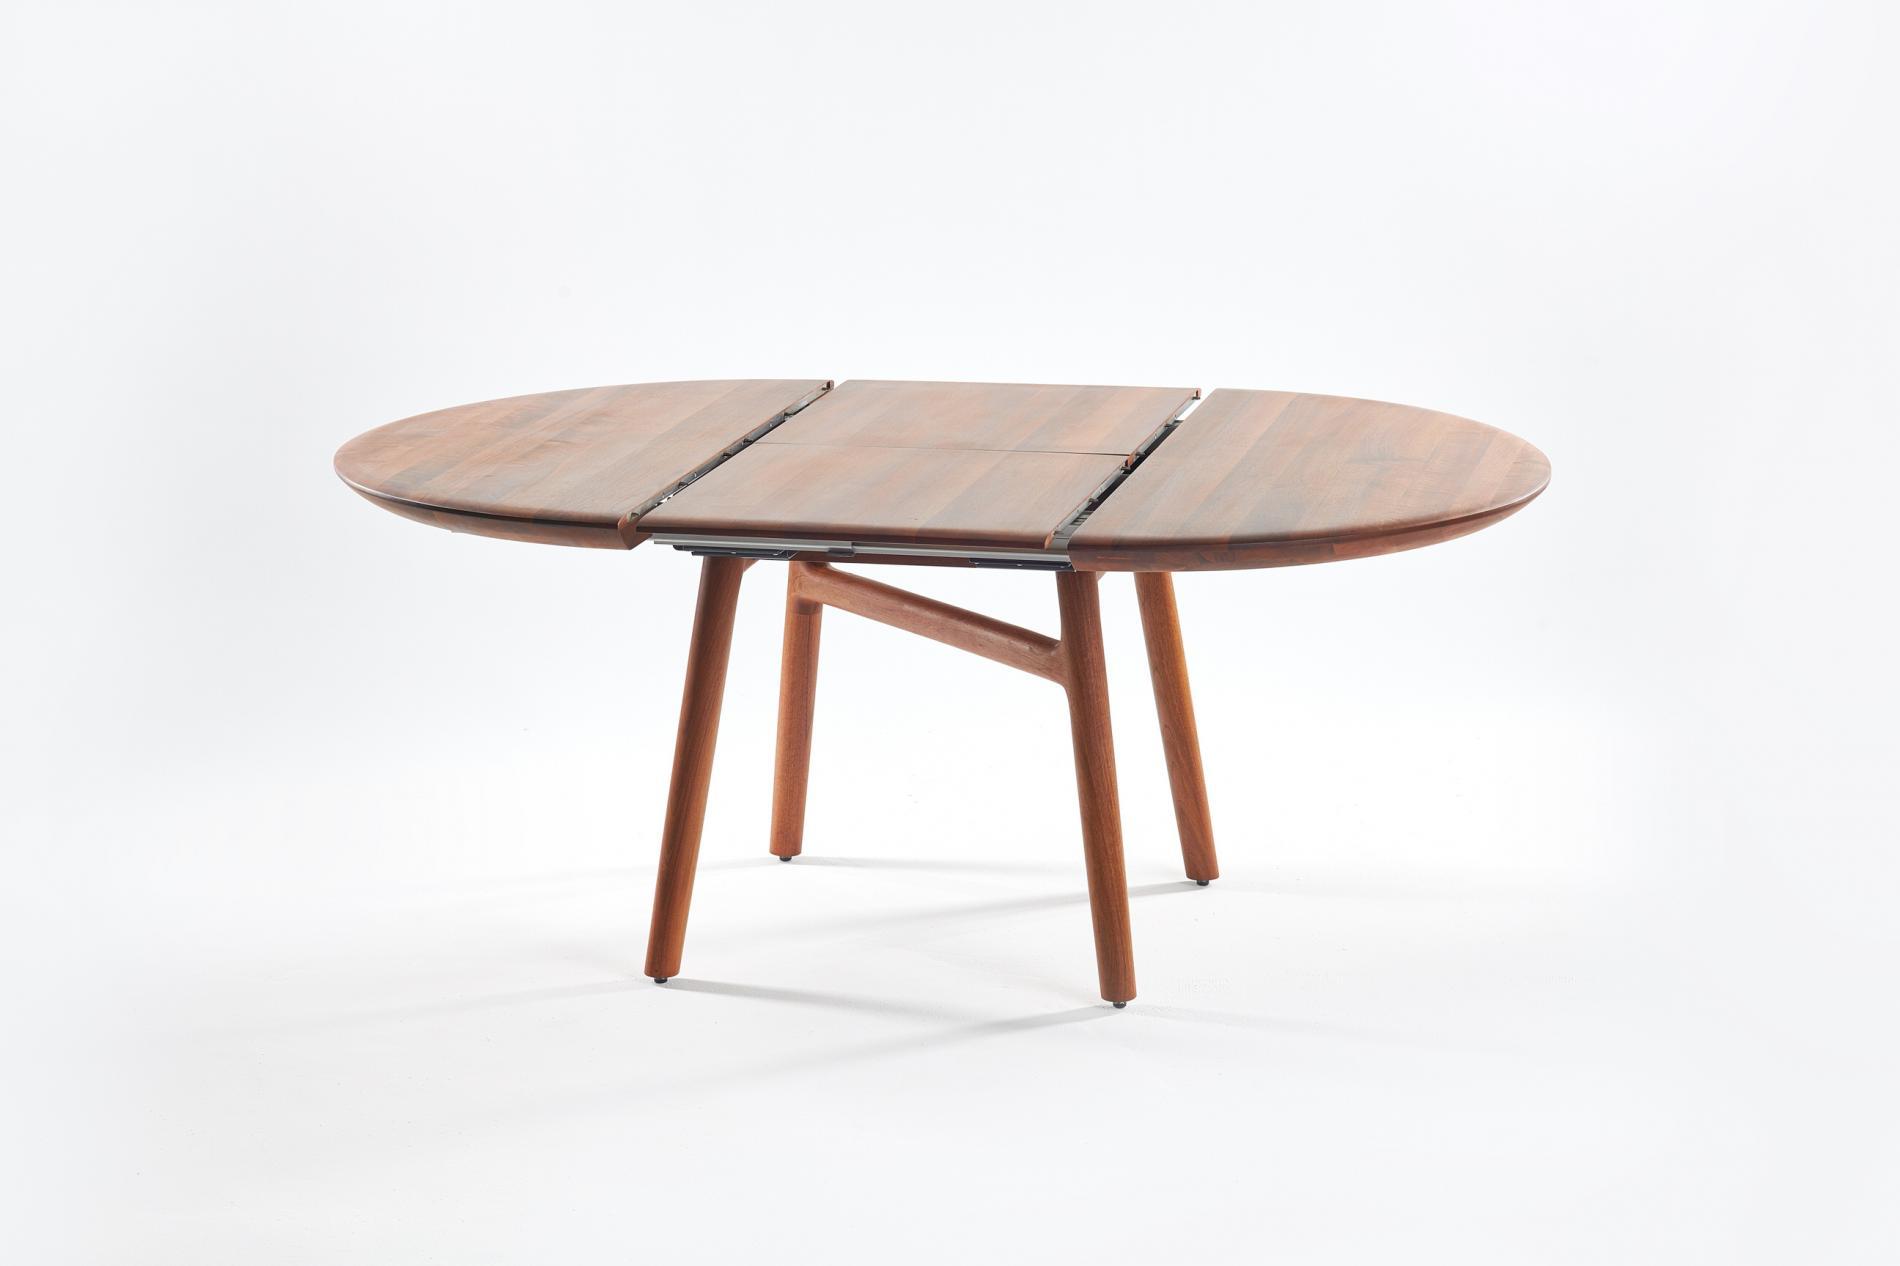 Dash Uitschuifbare rond tafel